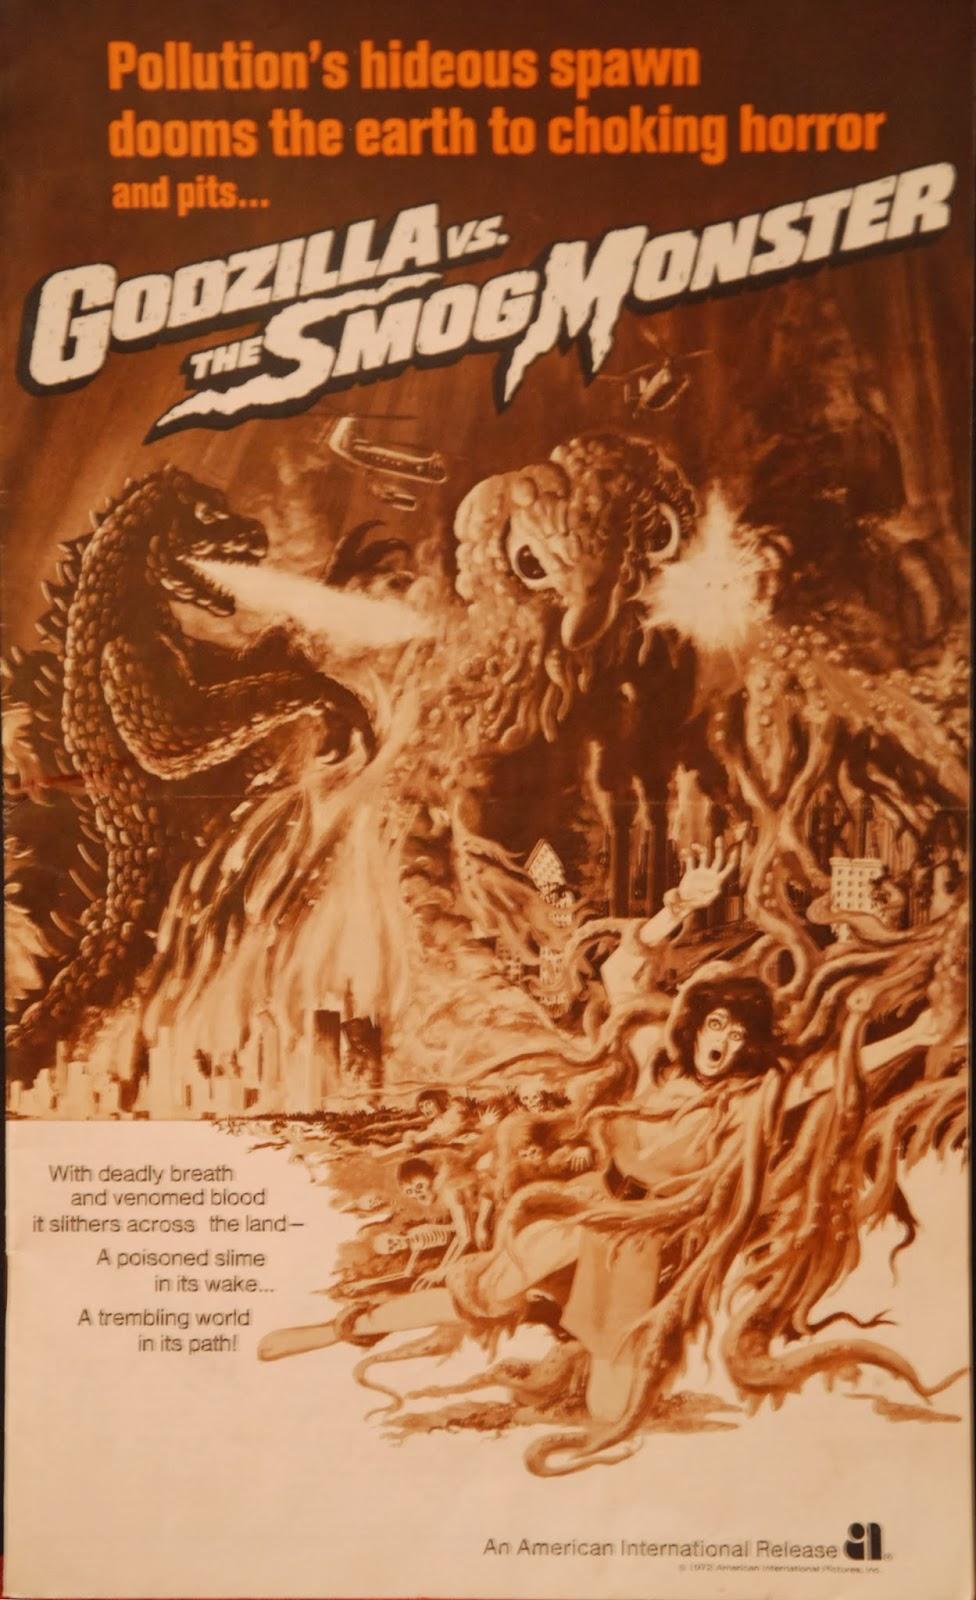 The Sphinx Godzilla Vs The Smog Monster Pressbook 1972